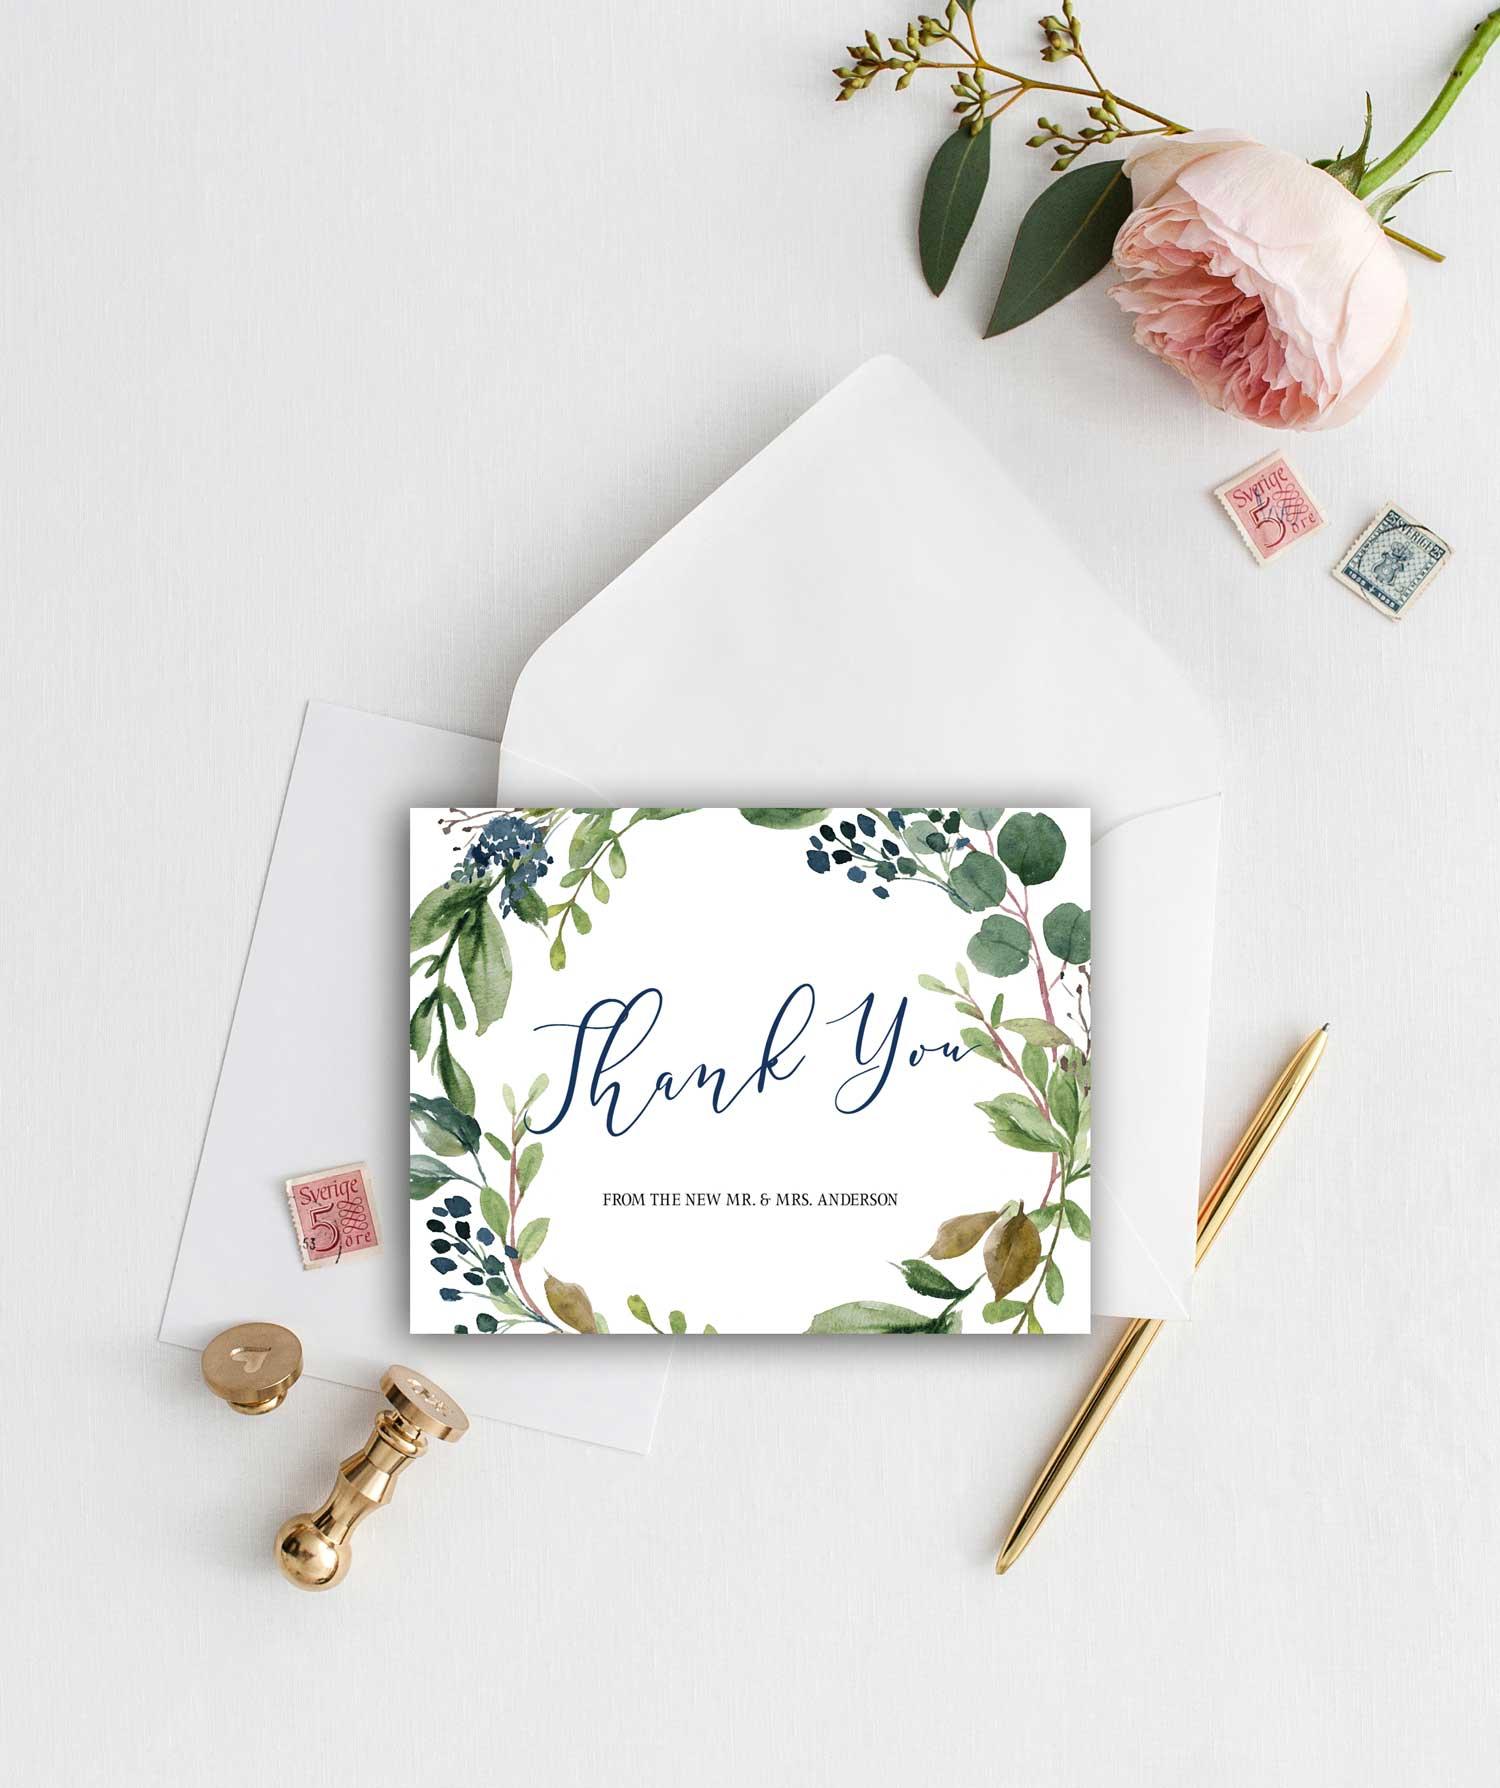 navy-harvest-thank-you-card-1